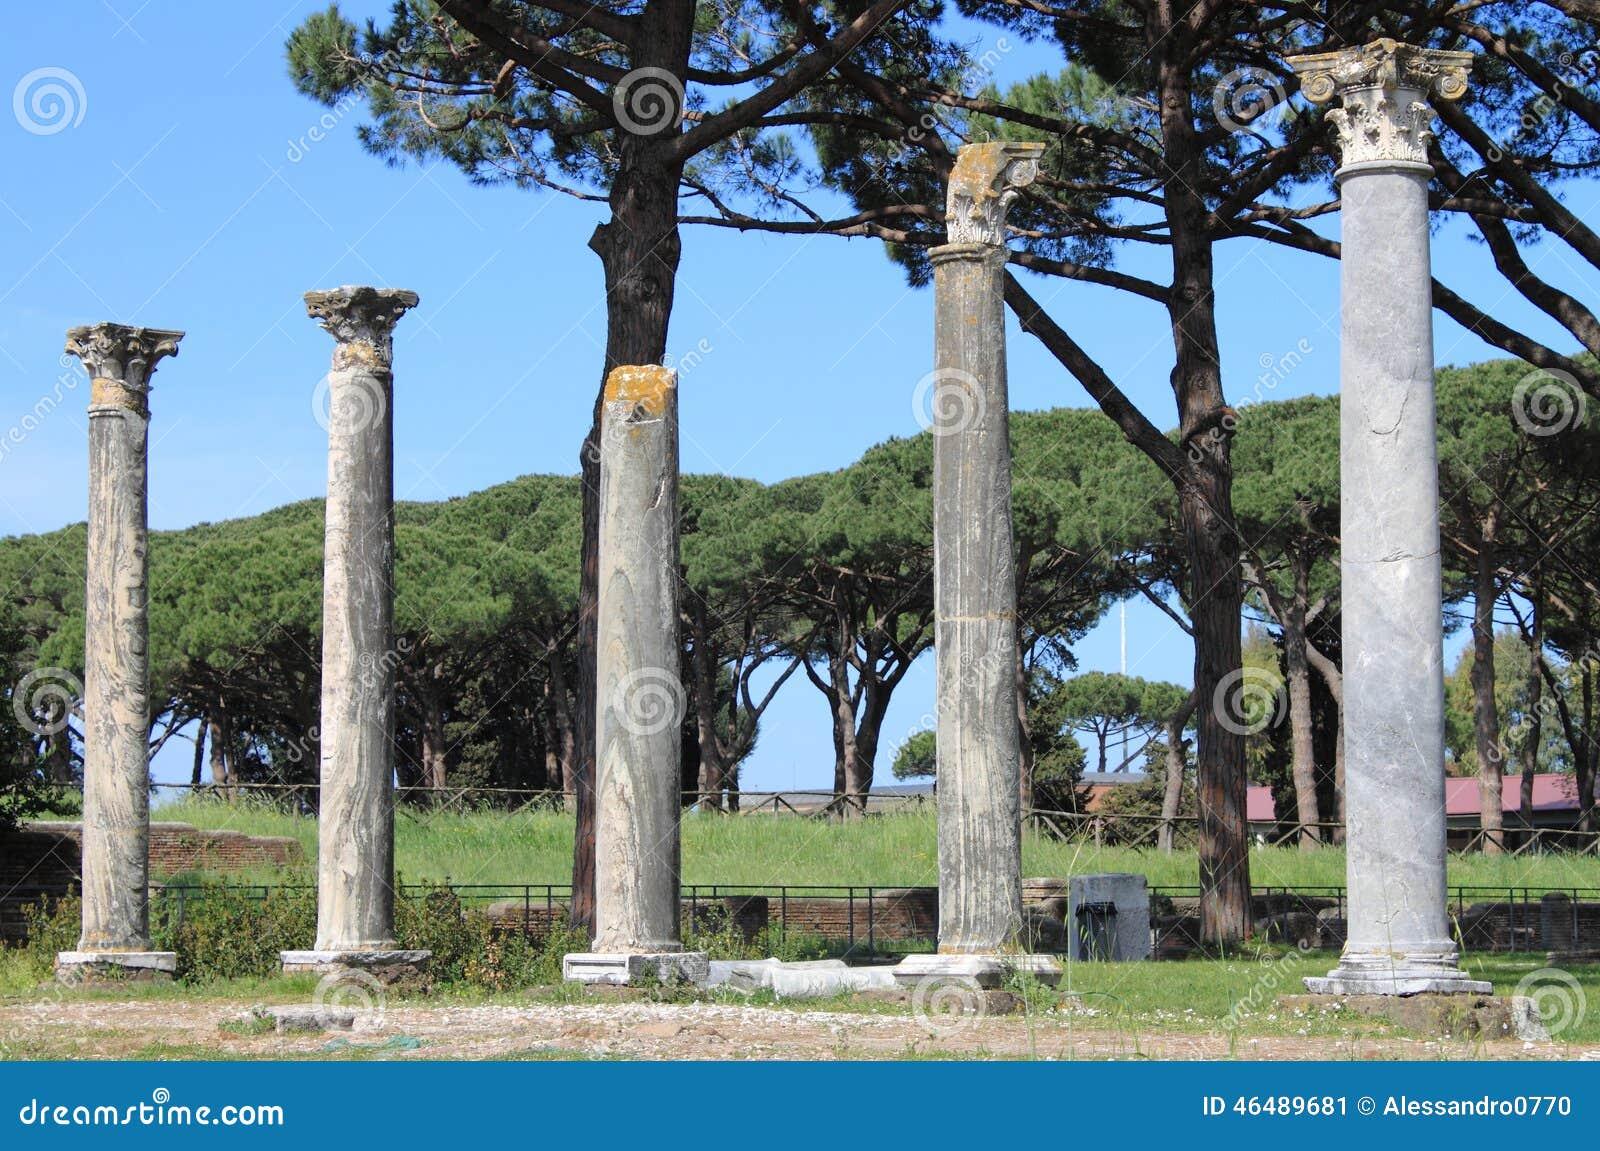 Columns of an ancient roman temple stock photo image for Mr arredamenti ostia antica